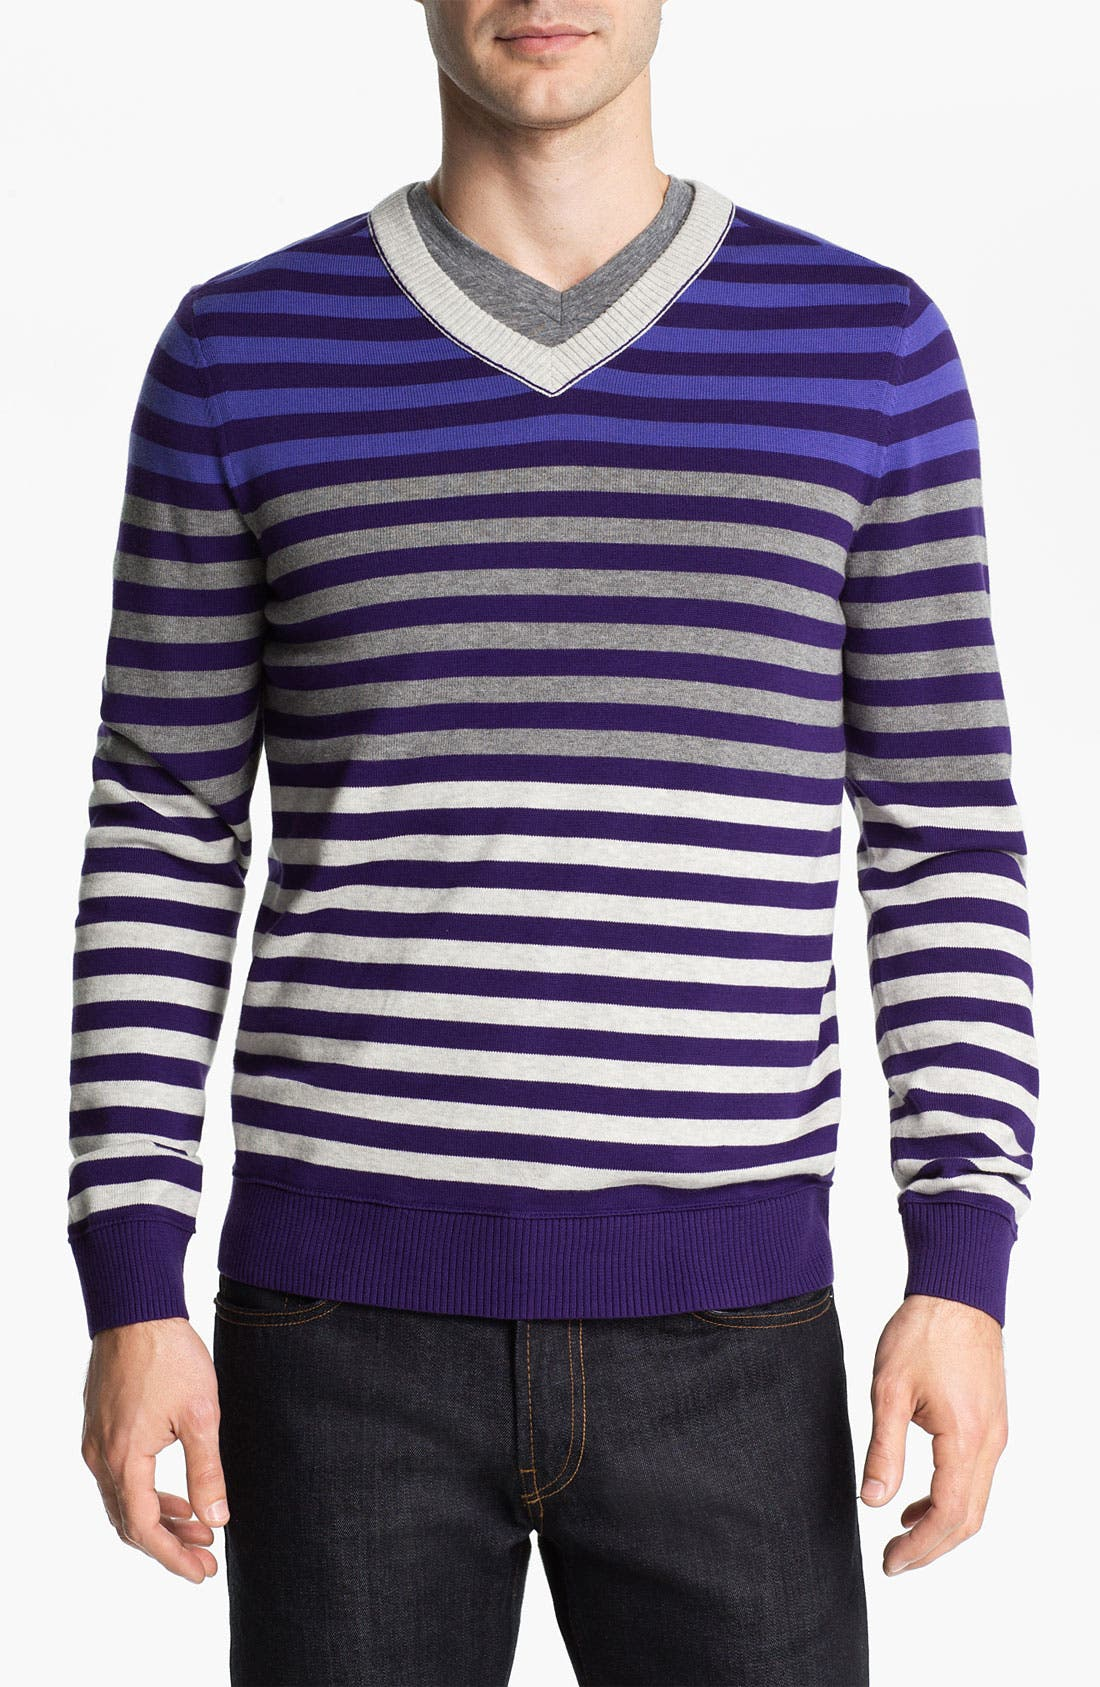 Alternate Image 1 Selected - Public Opinion Stripe V-Neck Sweater